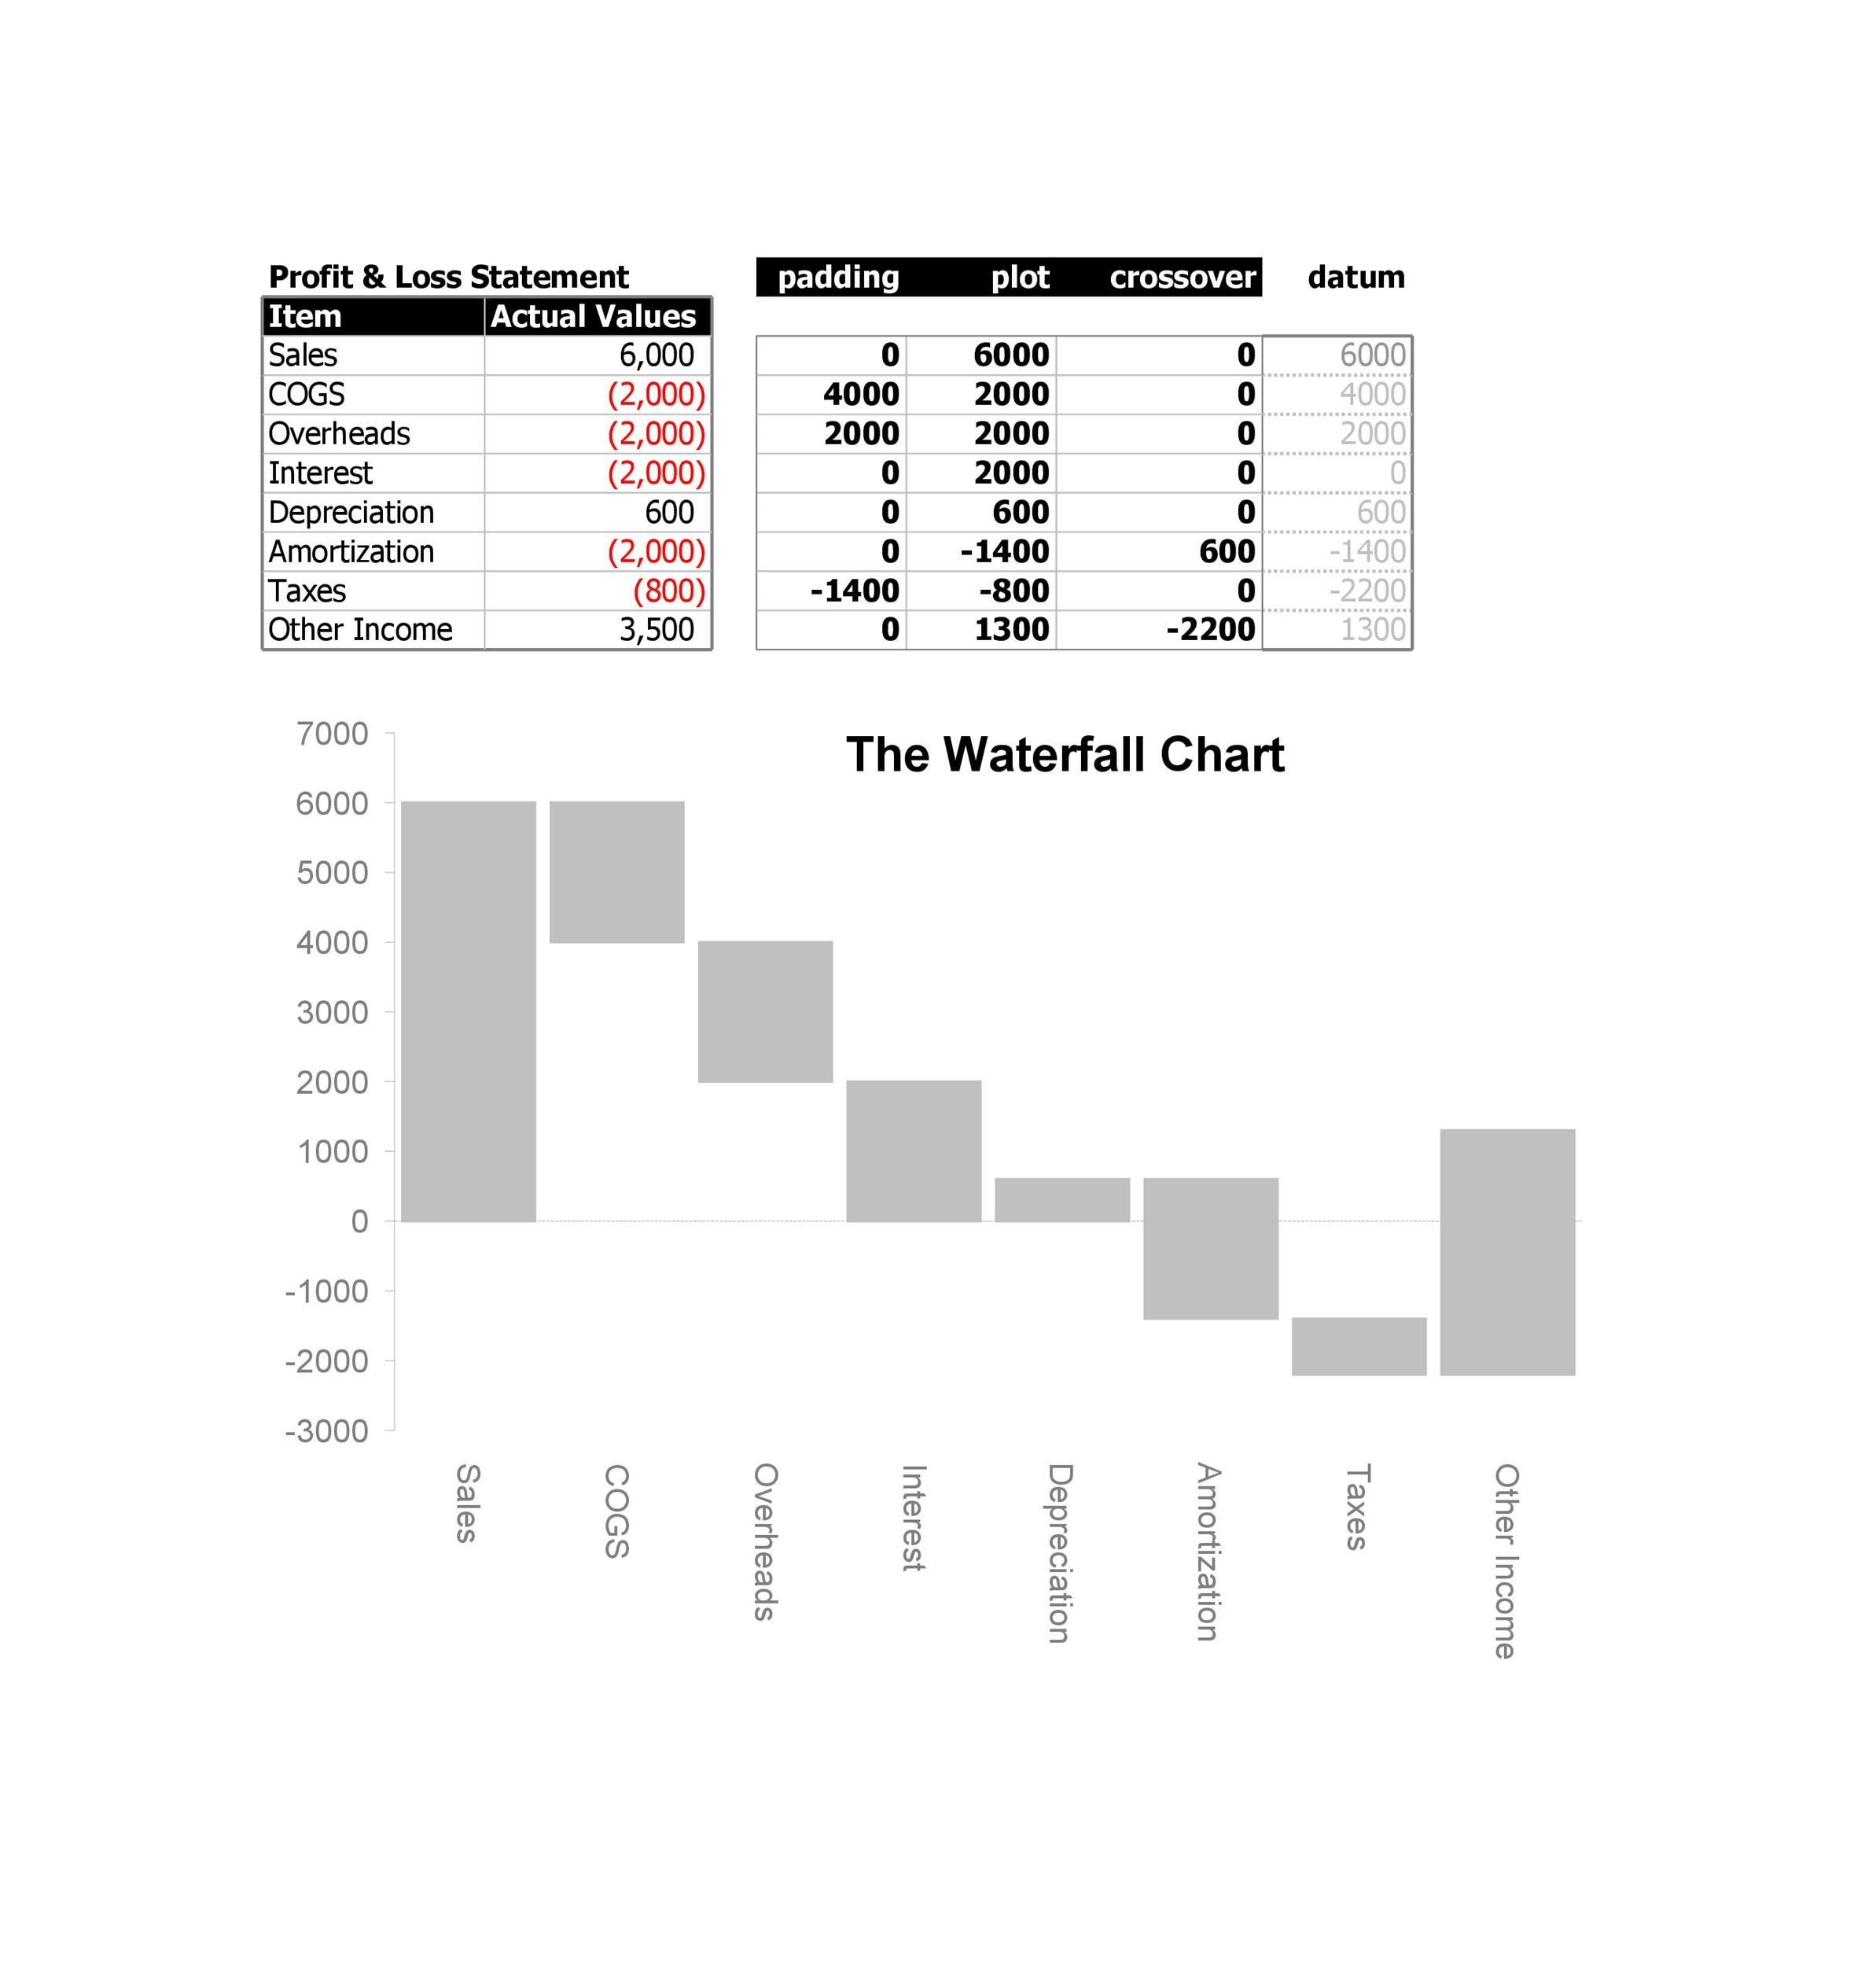 Free waterfall charts template 09